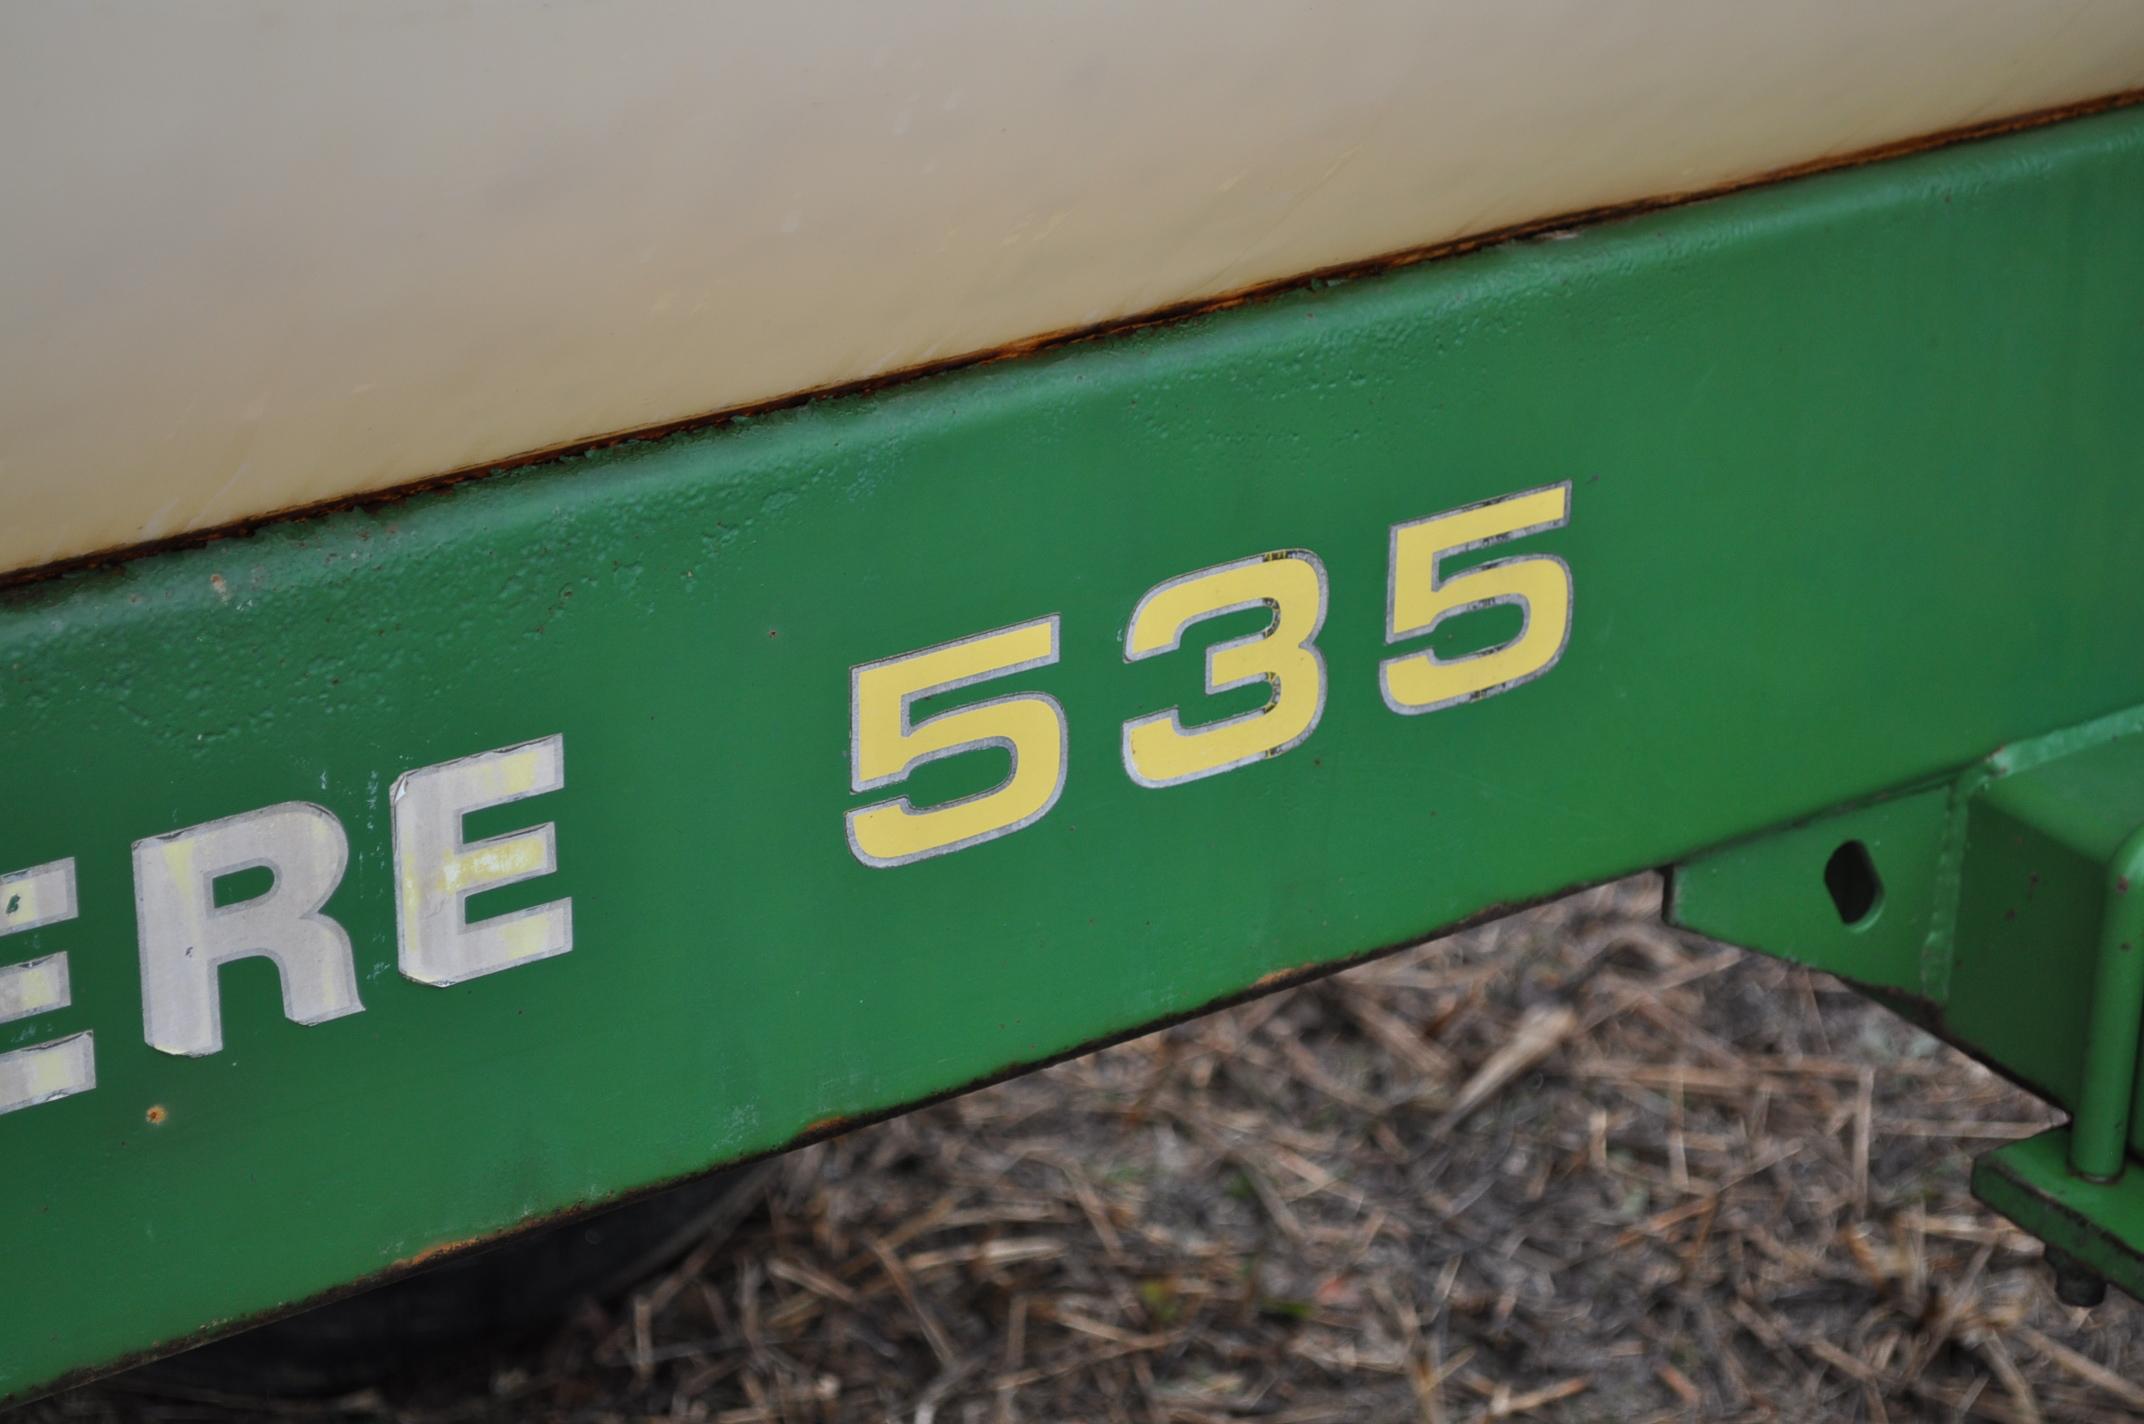 John Deere 535 pull-type sprayer, 350 gallon tank, 30' boom - Image 3 of 11